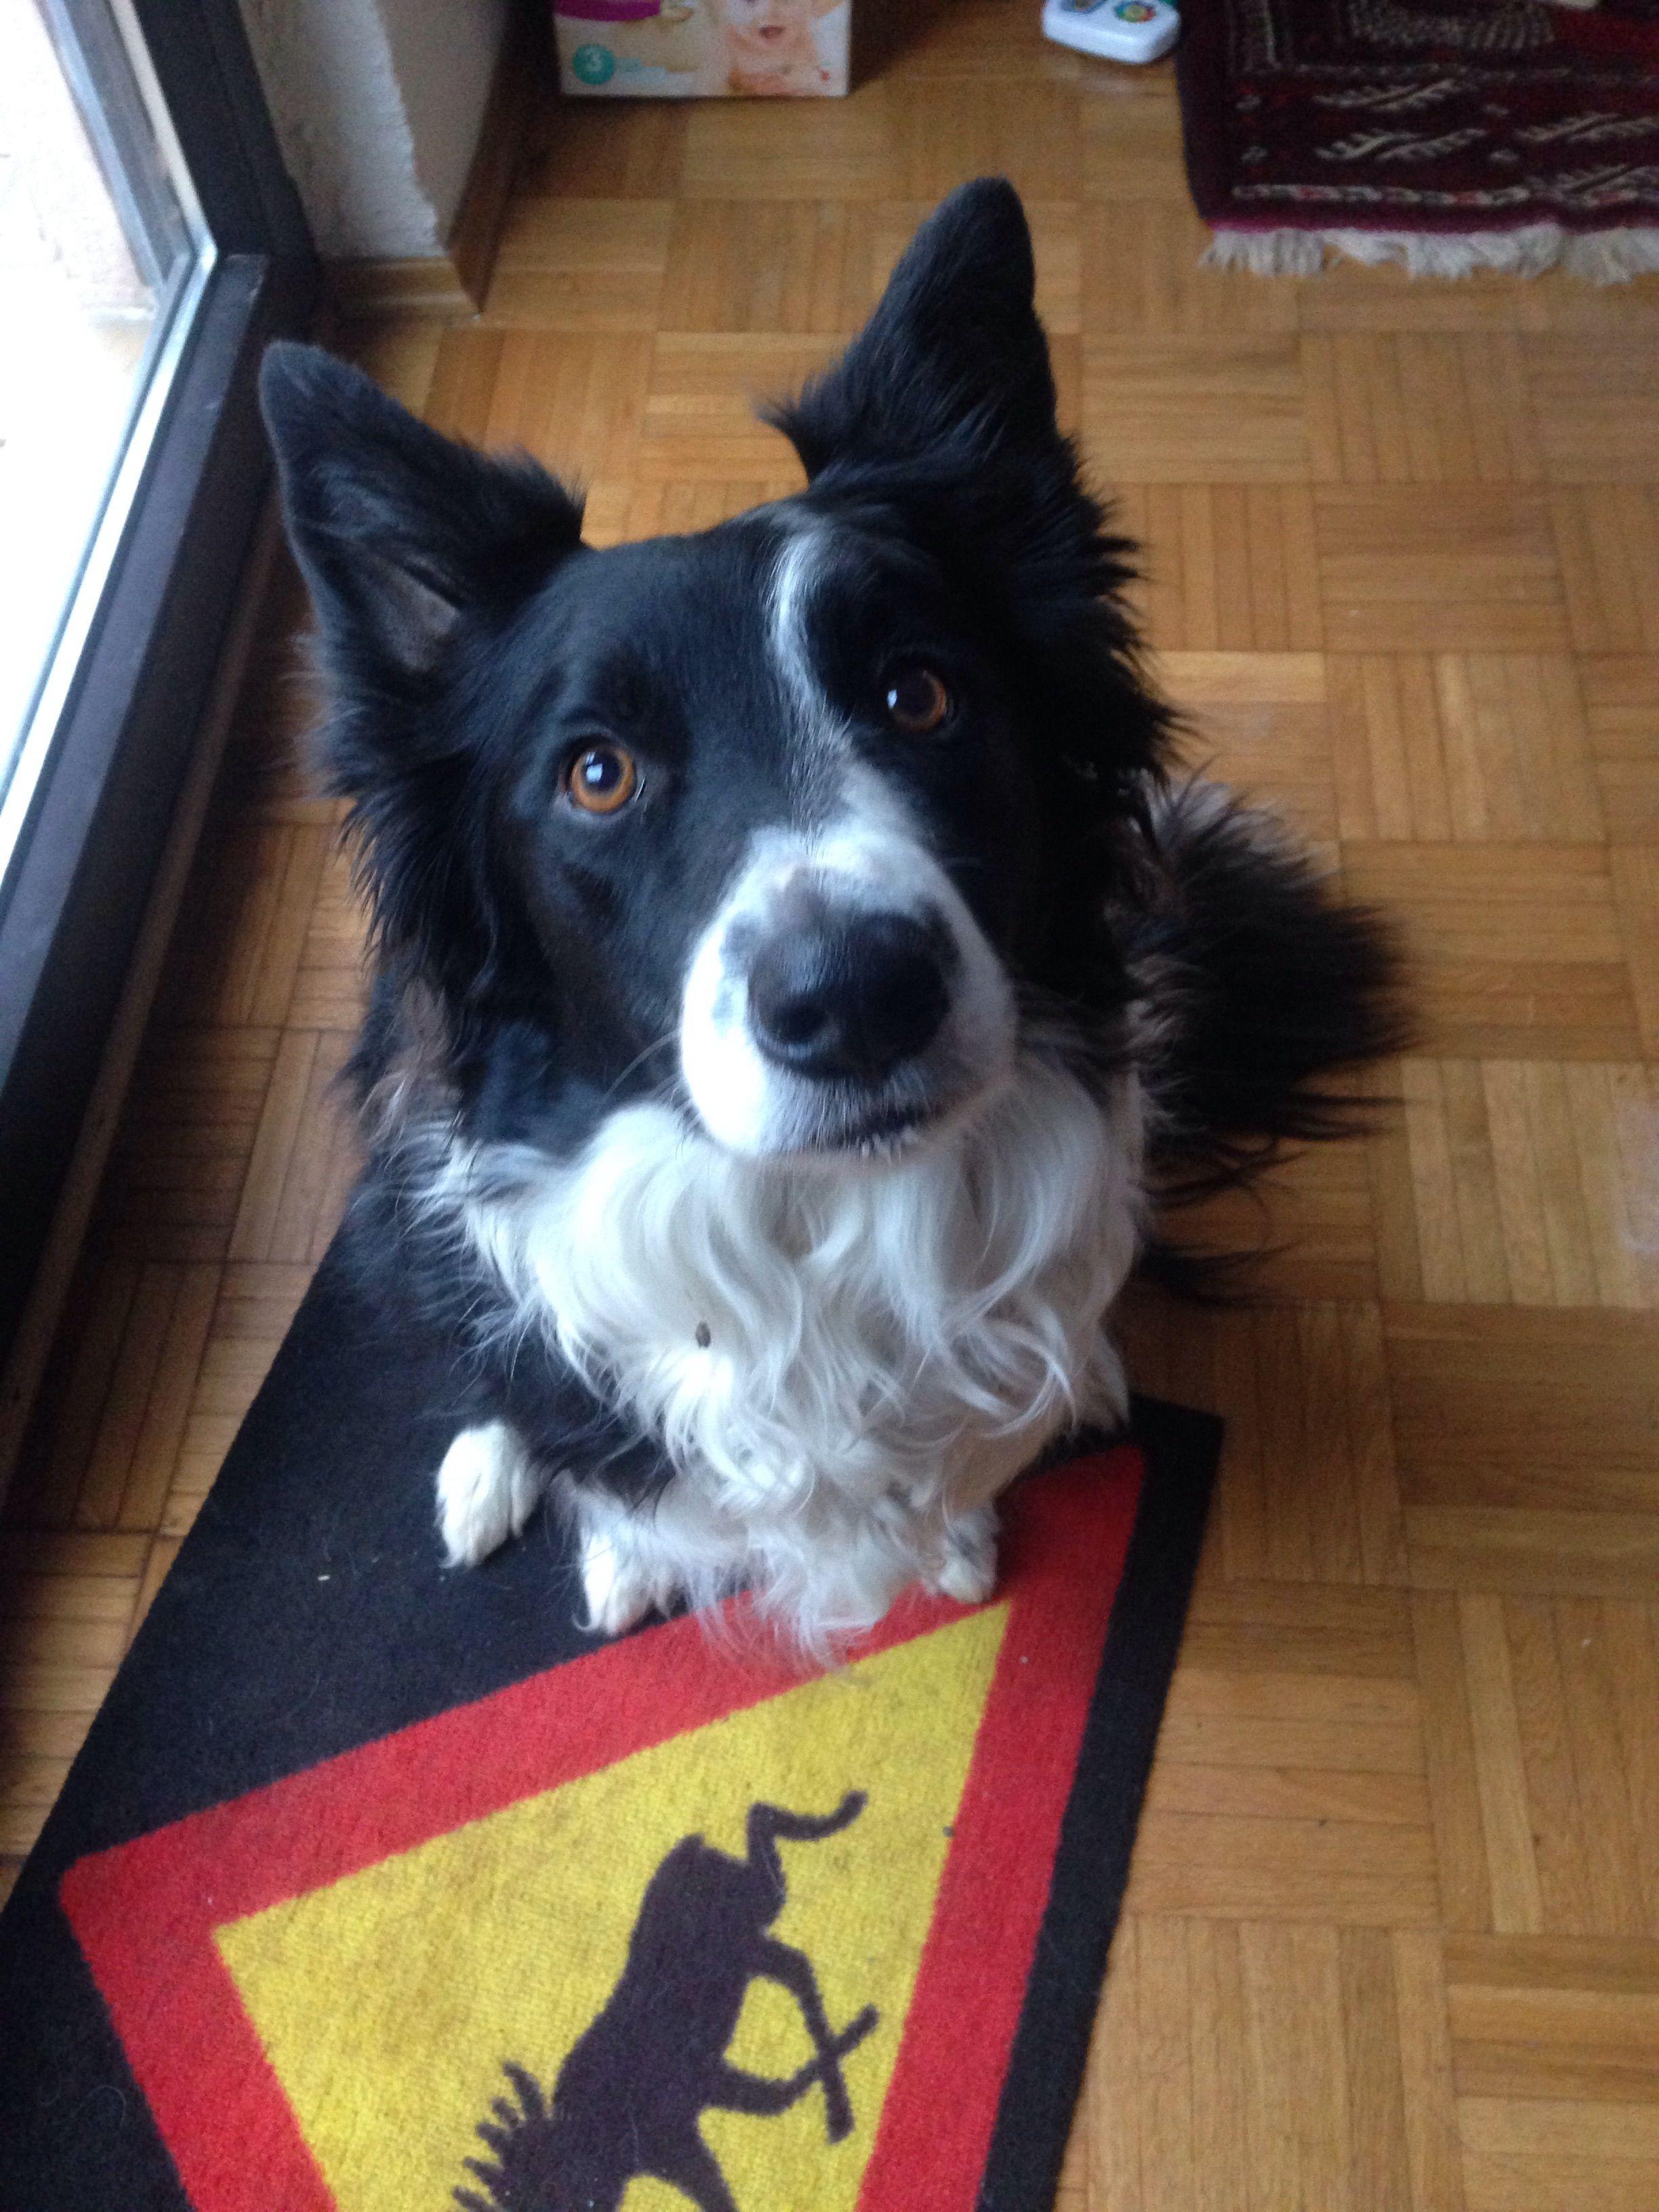 Kaze Border Collie Pawshake Schone Hunde Hunde Bilder